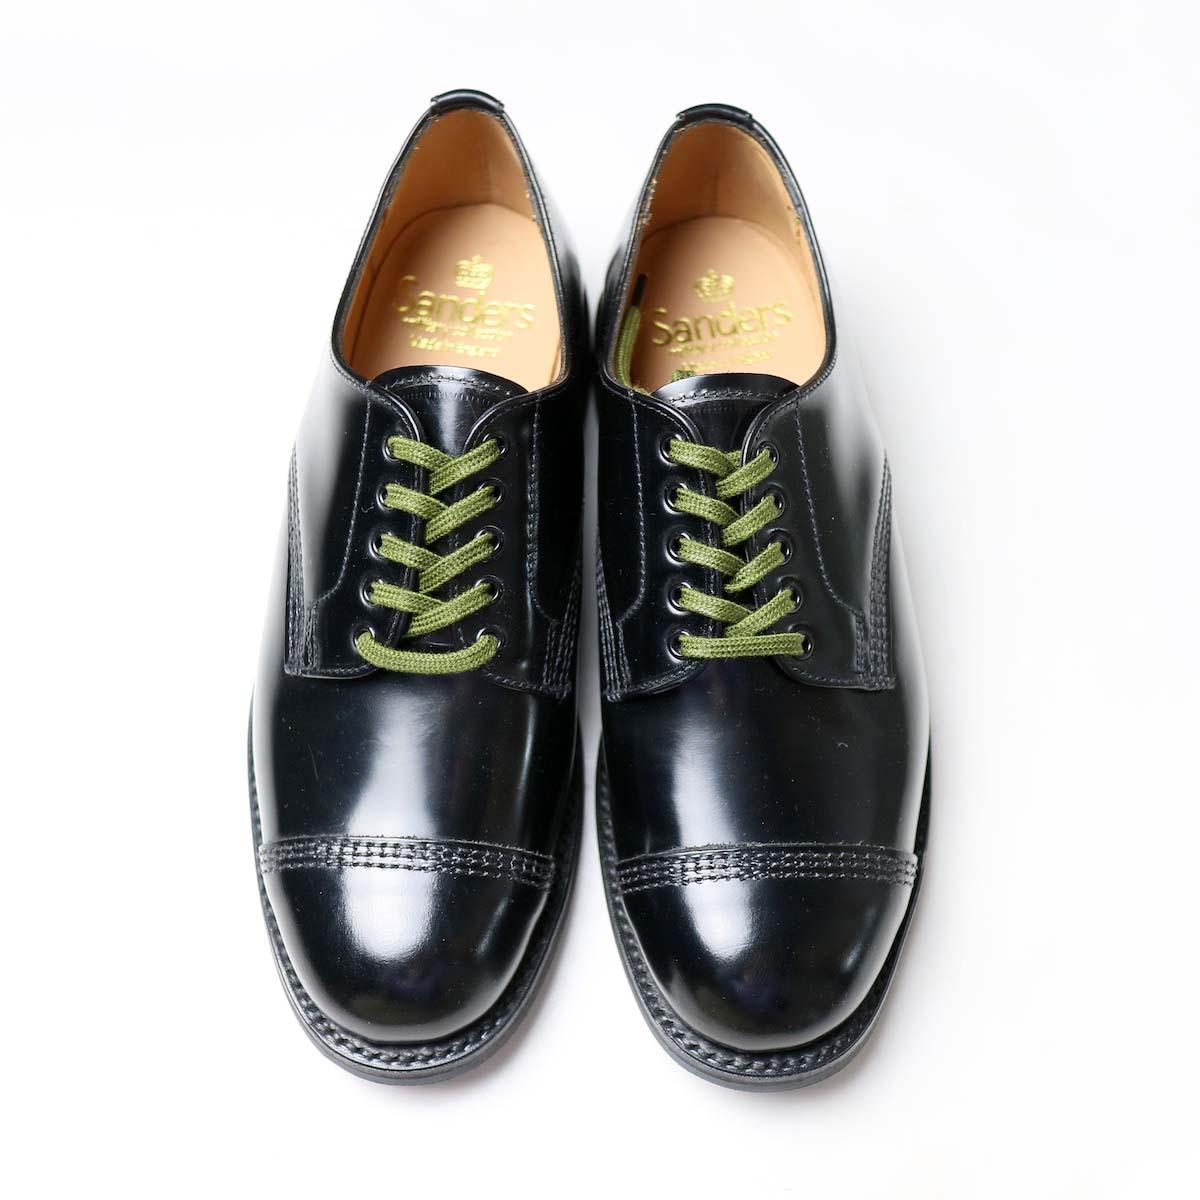 SANDERS / Military Derby Shoe 正面